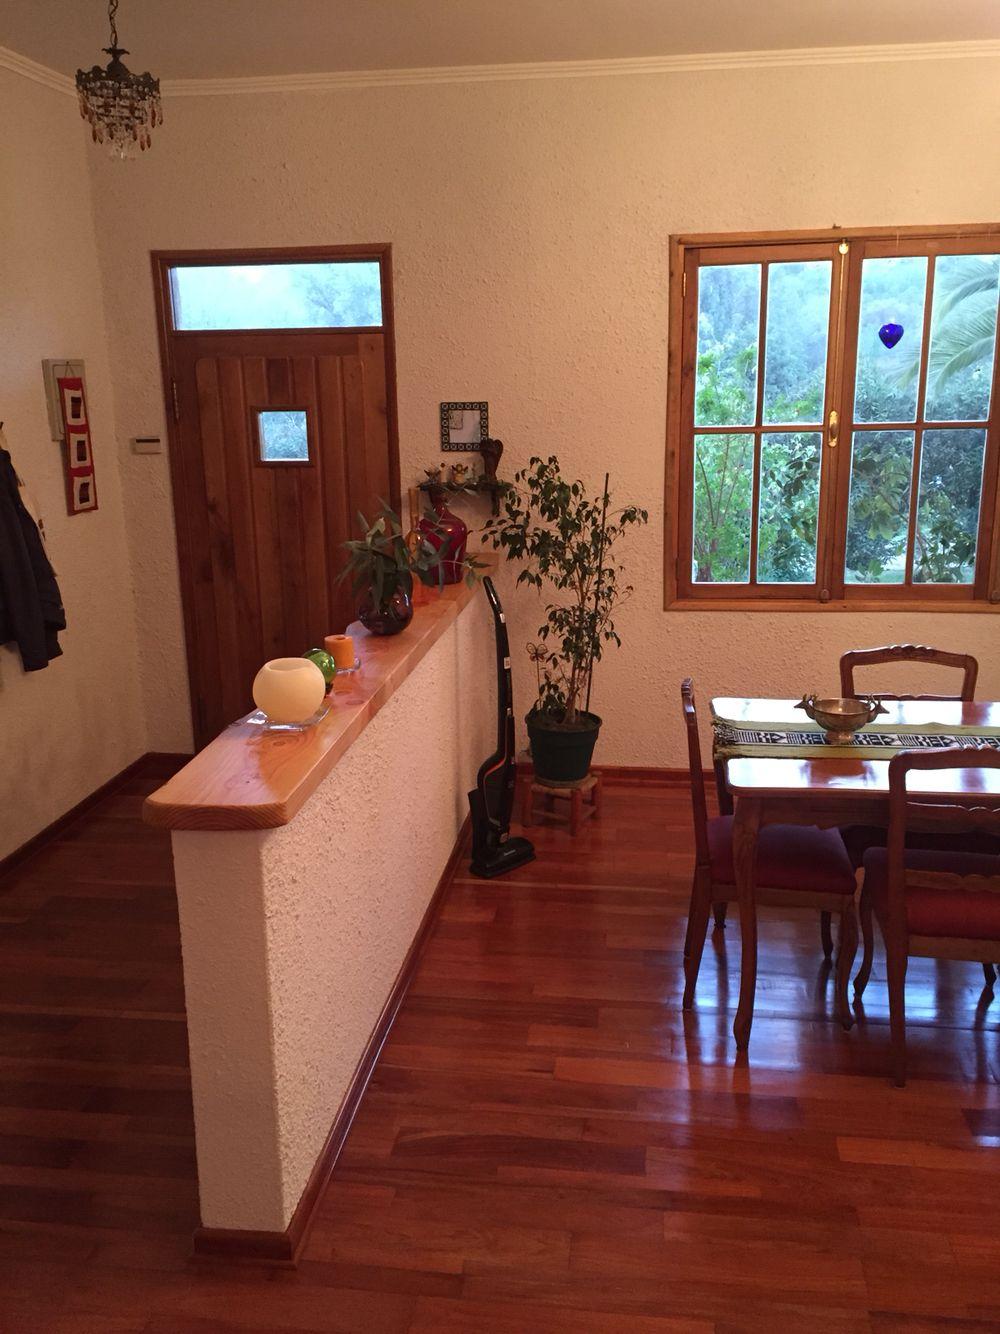 Medio muro madera piso de madera wood floor mi casa for Decoracion piso montana